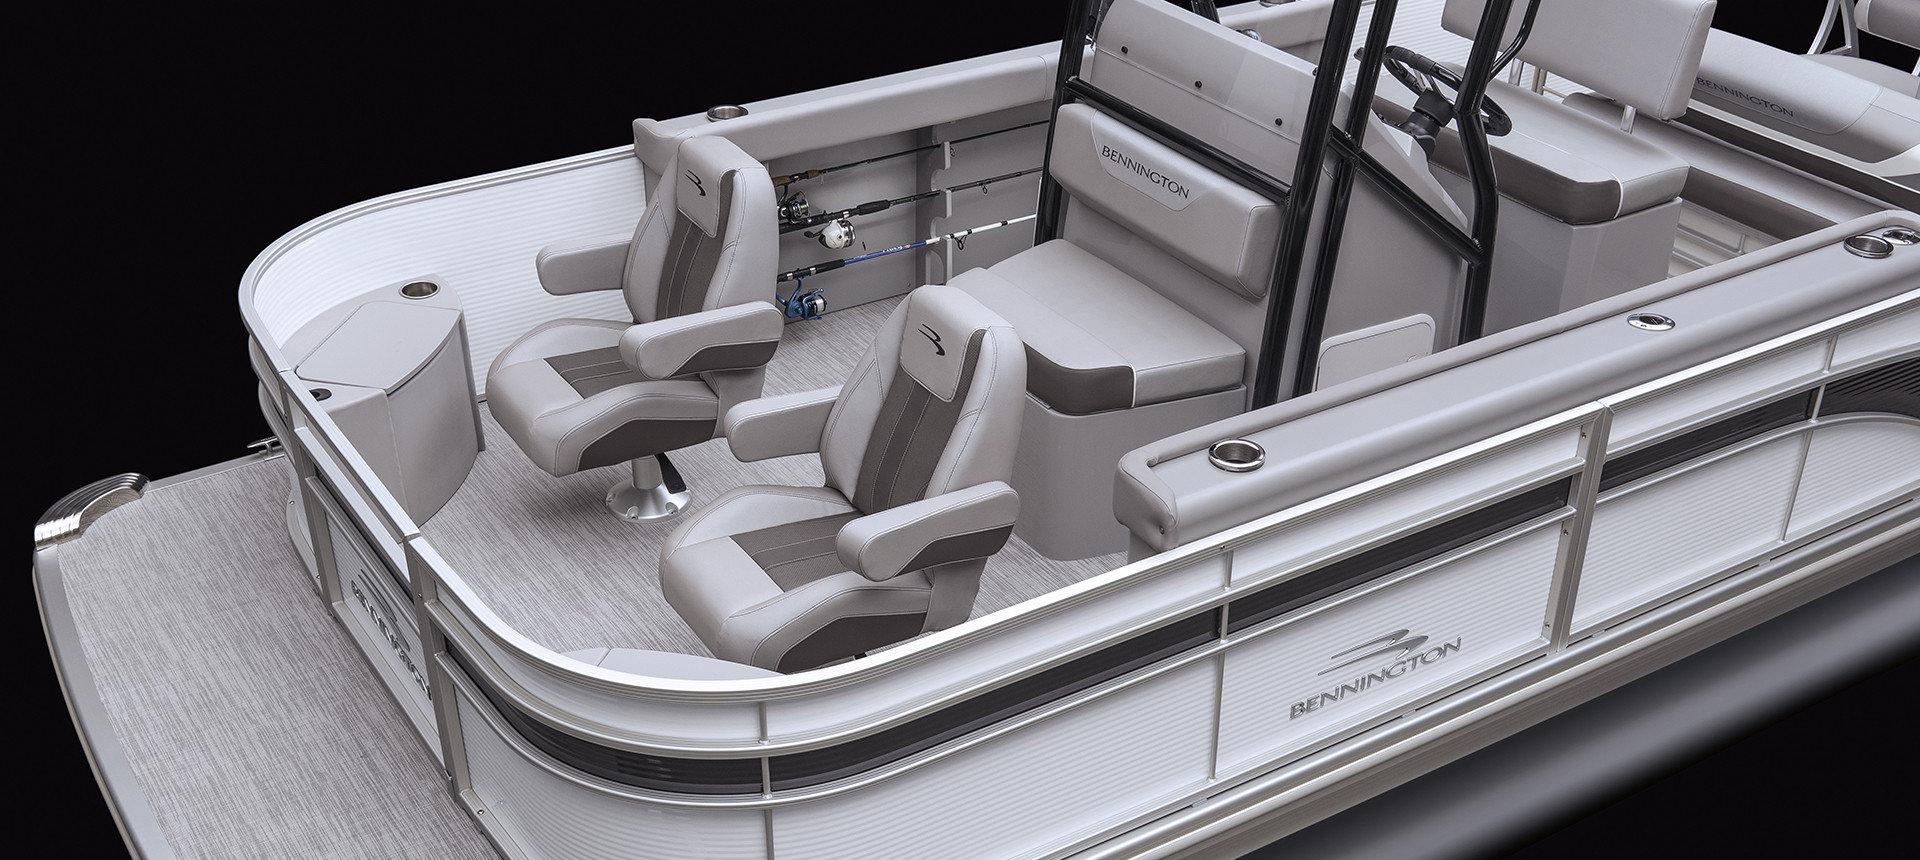 Pic of SX model boat